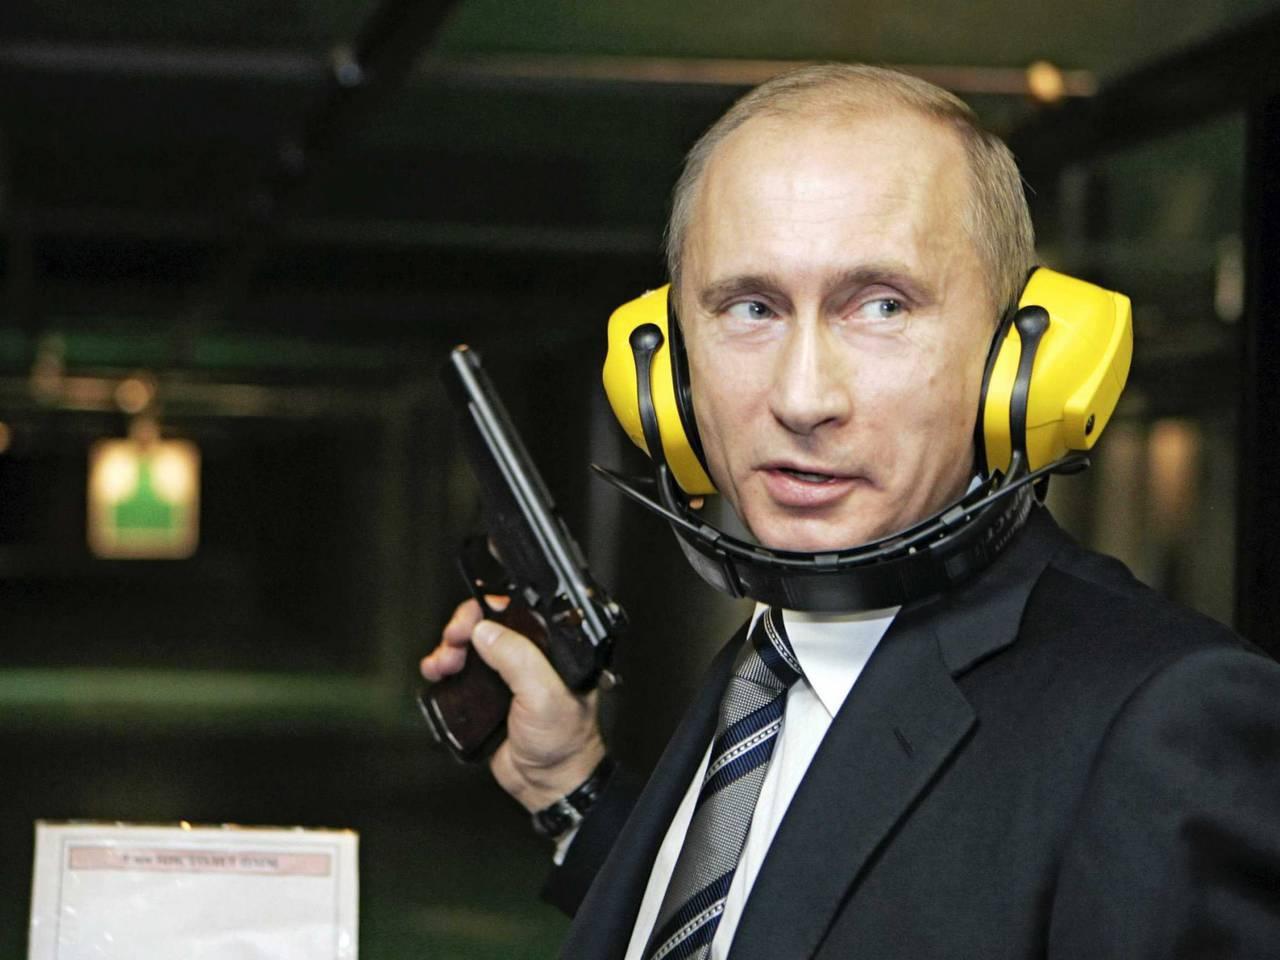 http://topwar.ru/uploads/posts/2014-11/1417133085_putin_gun.jpg